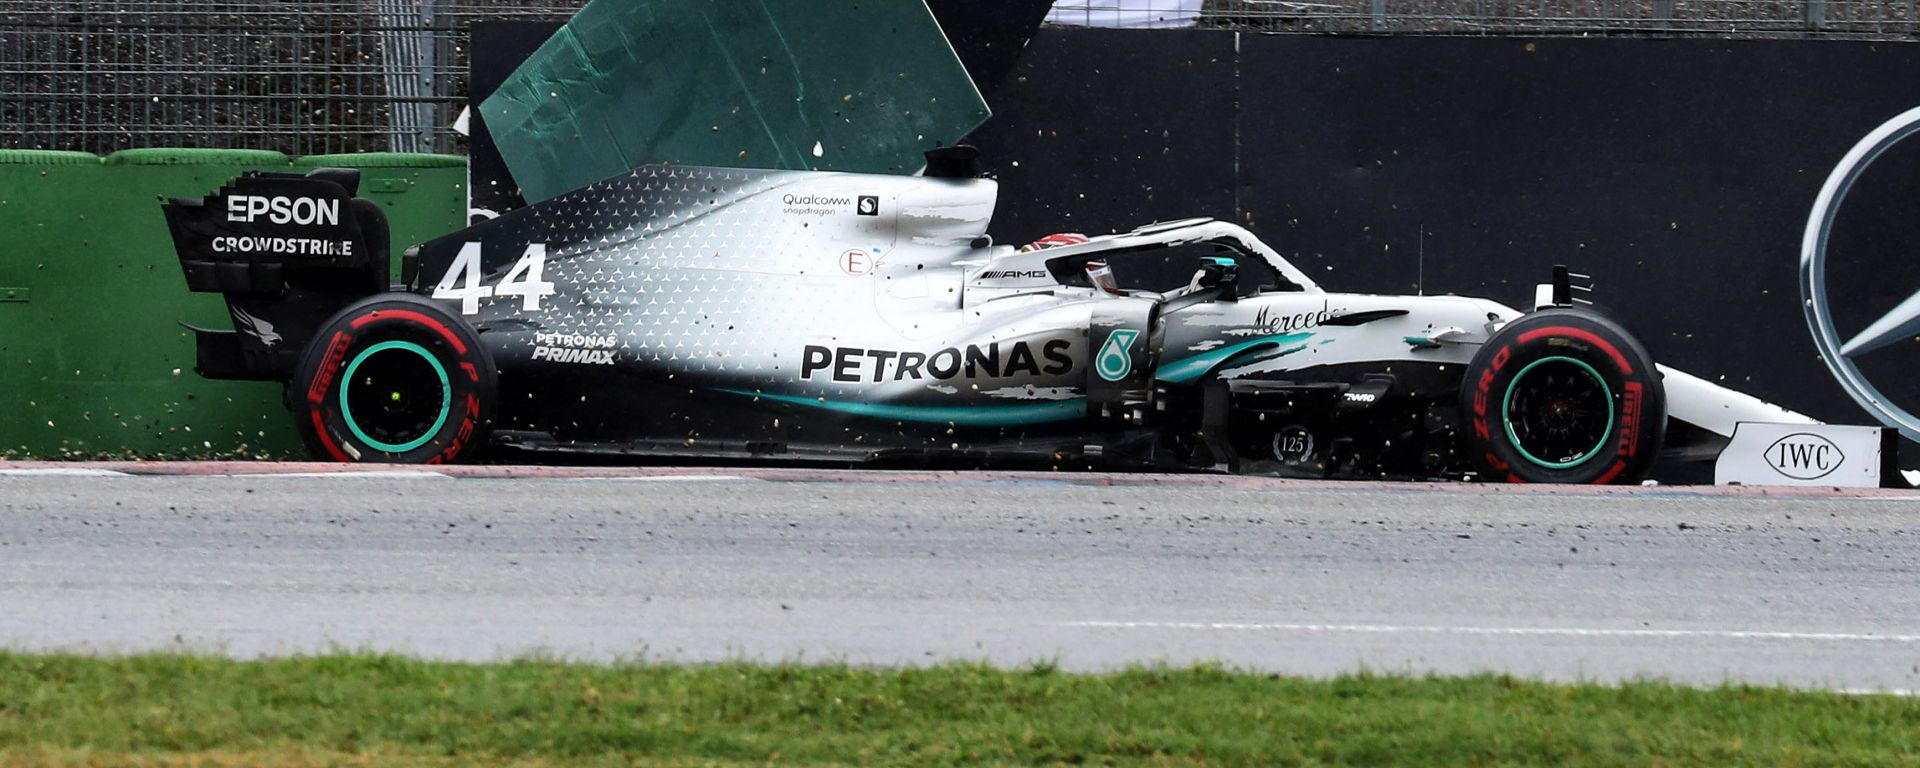 F1 GP Germania 2019, Hockenheim: l'incidente di Lewis Hamilton (Mercedes)